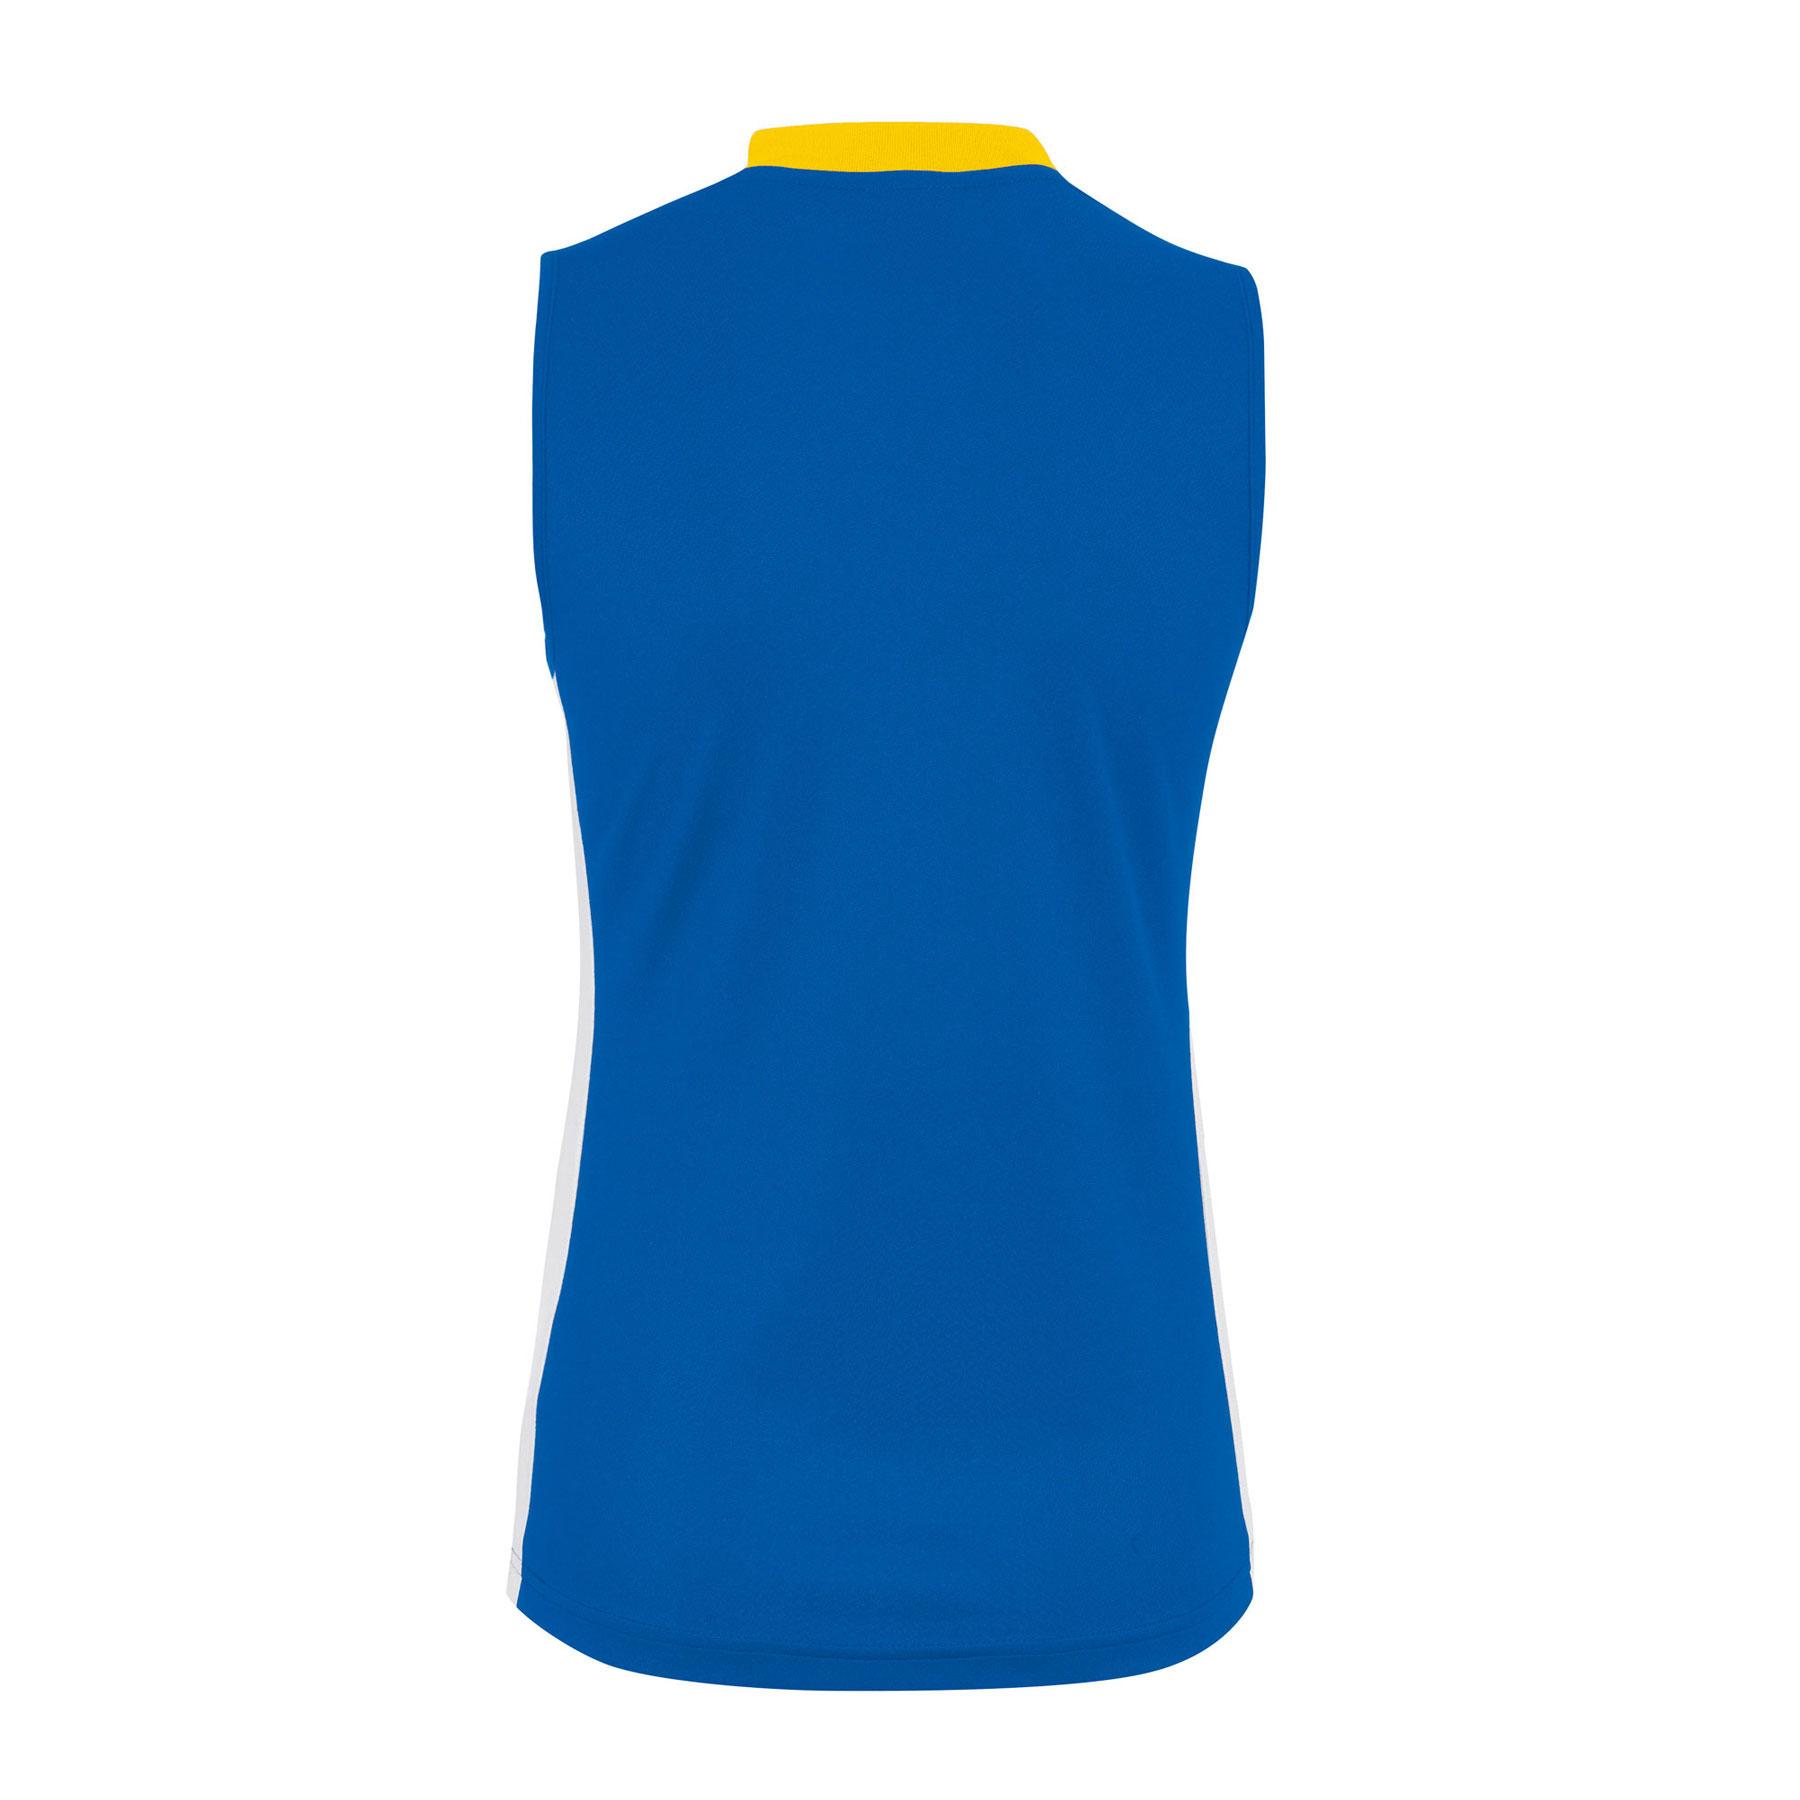 05_em1f0z_bleu_jaune_blanc--0-0--a11f37c8-52ed-4088-98ba-ecbf5396ac7b